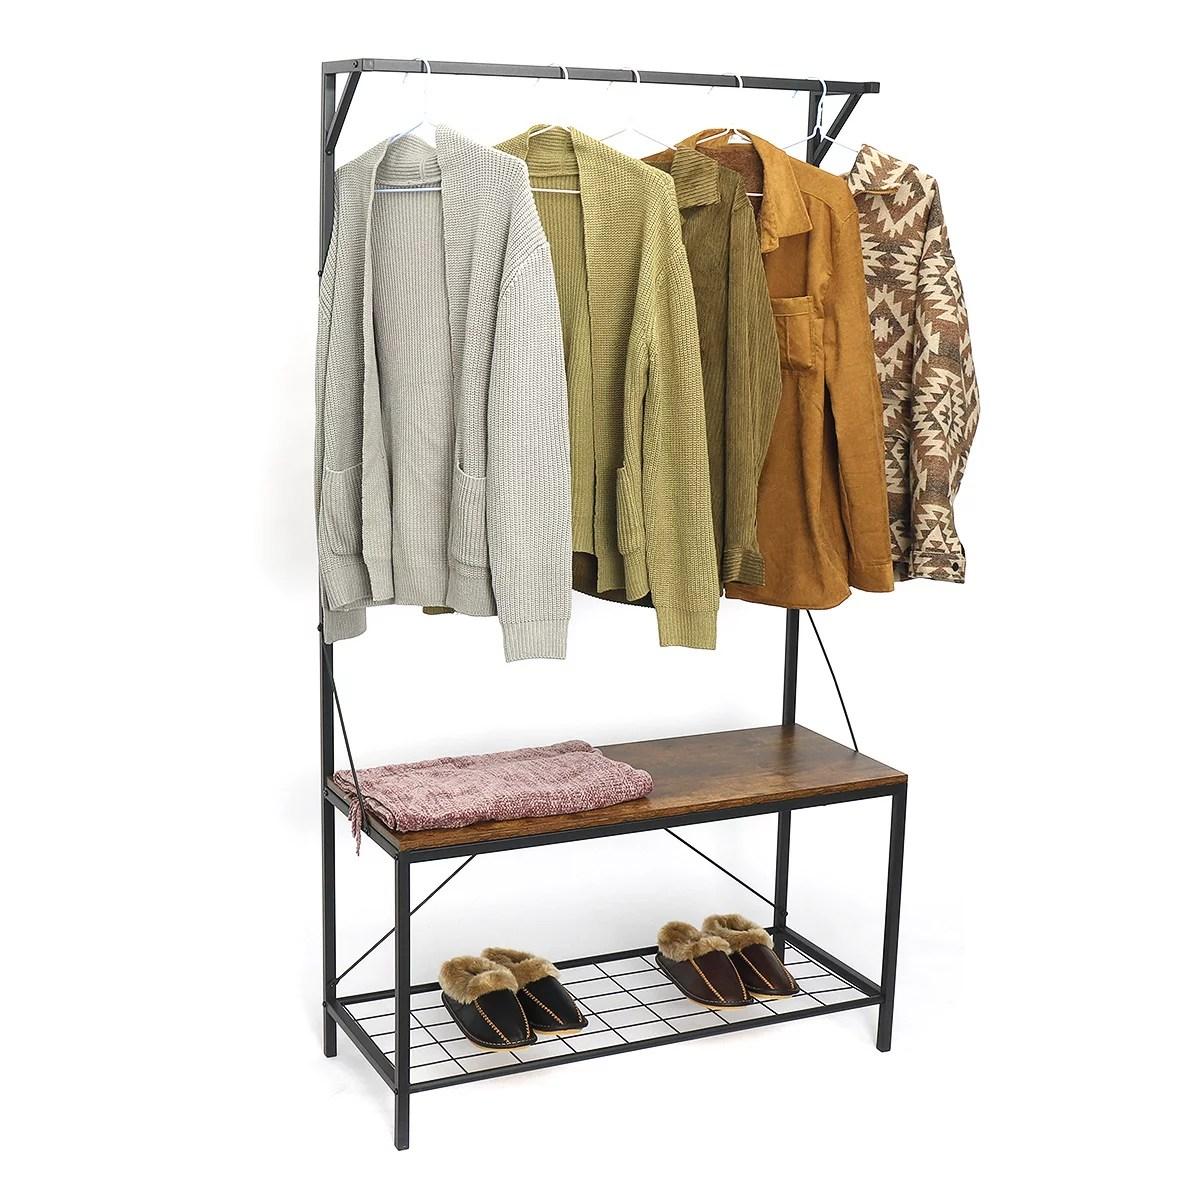 71 industrial pipe clothing garment rack coat rack shoe storage bench 3 tiers and 5 hooks hall tree storage organizer shelf walmart com